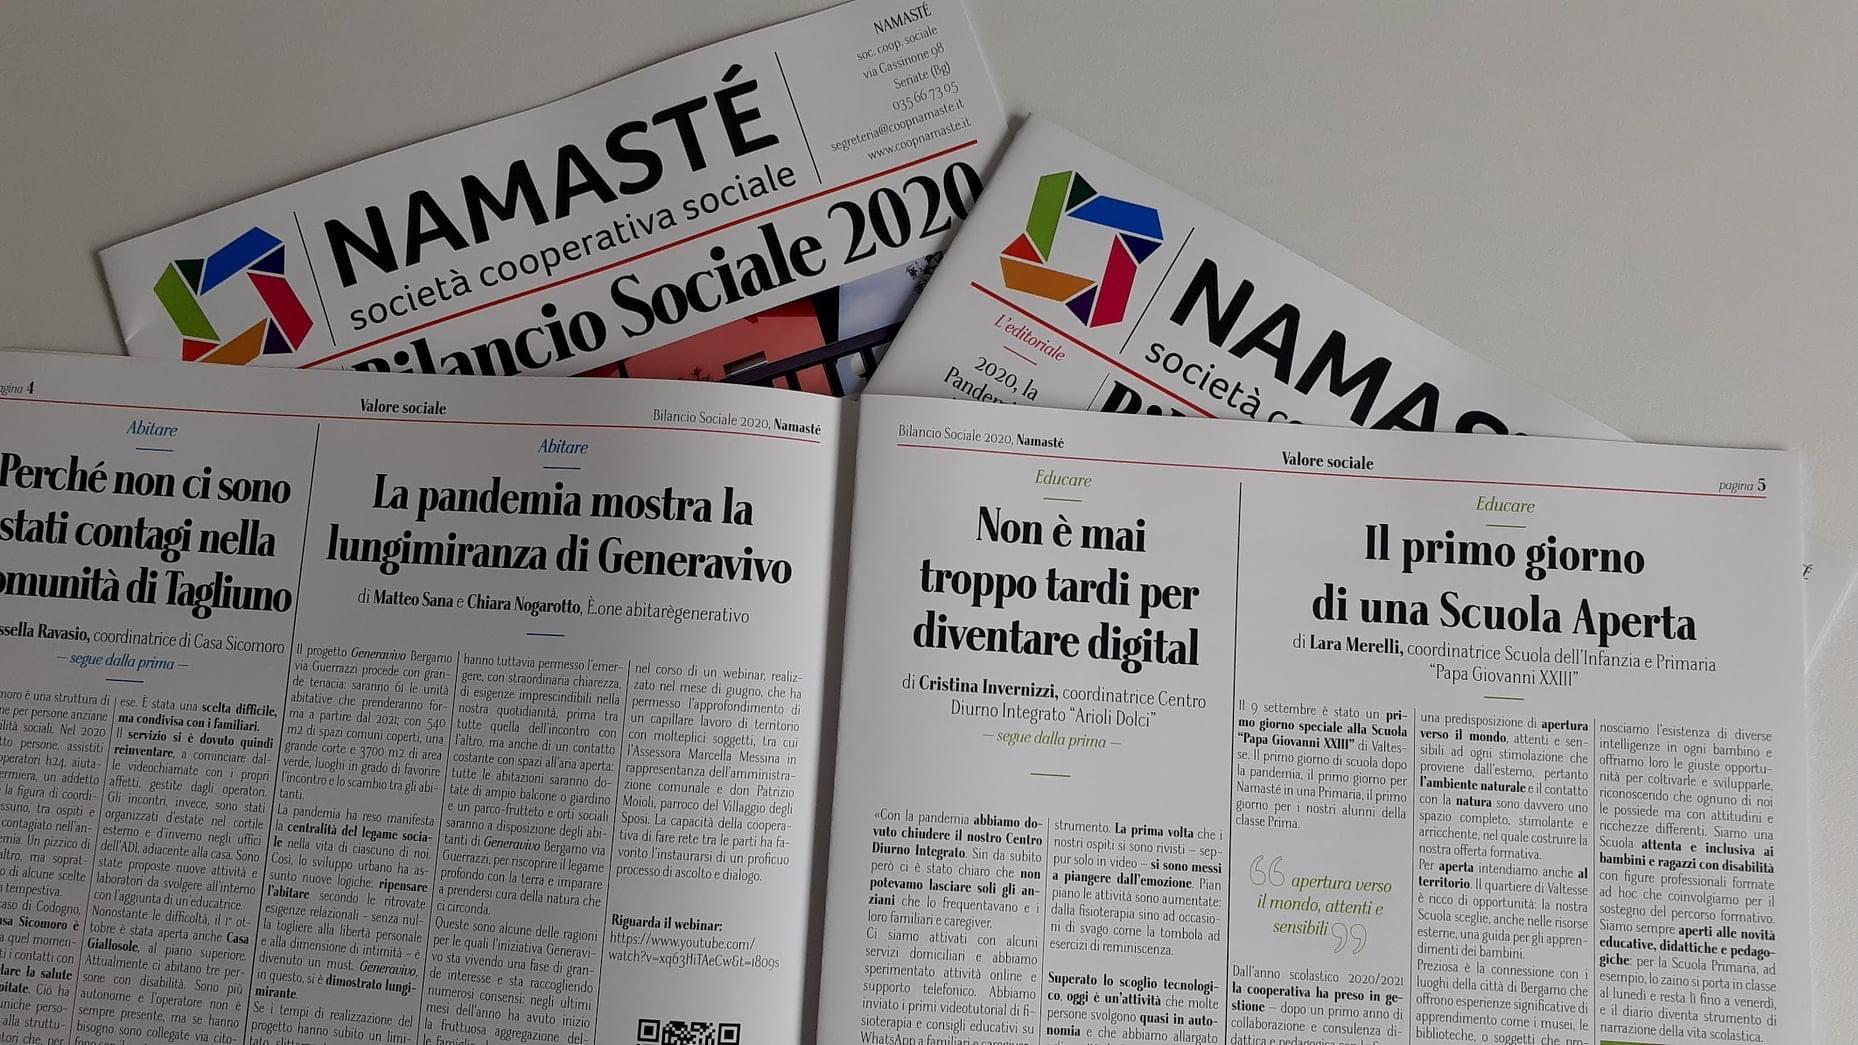 Generavivo nel Bilancio Sociale 2020 di Namasté